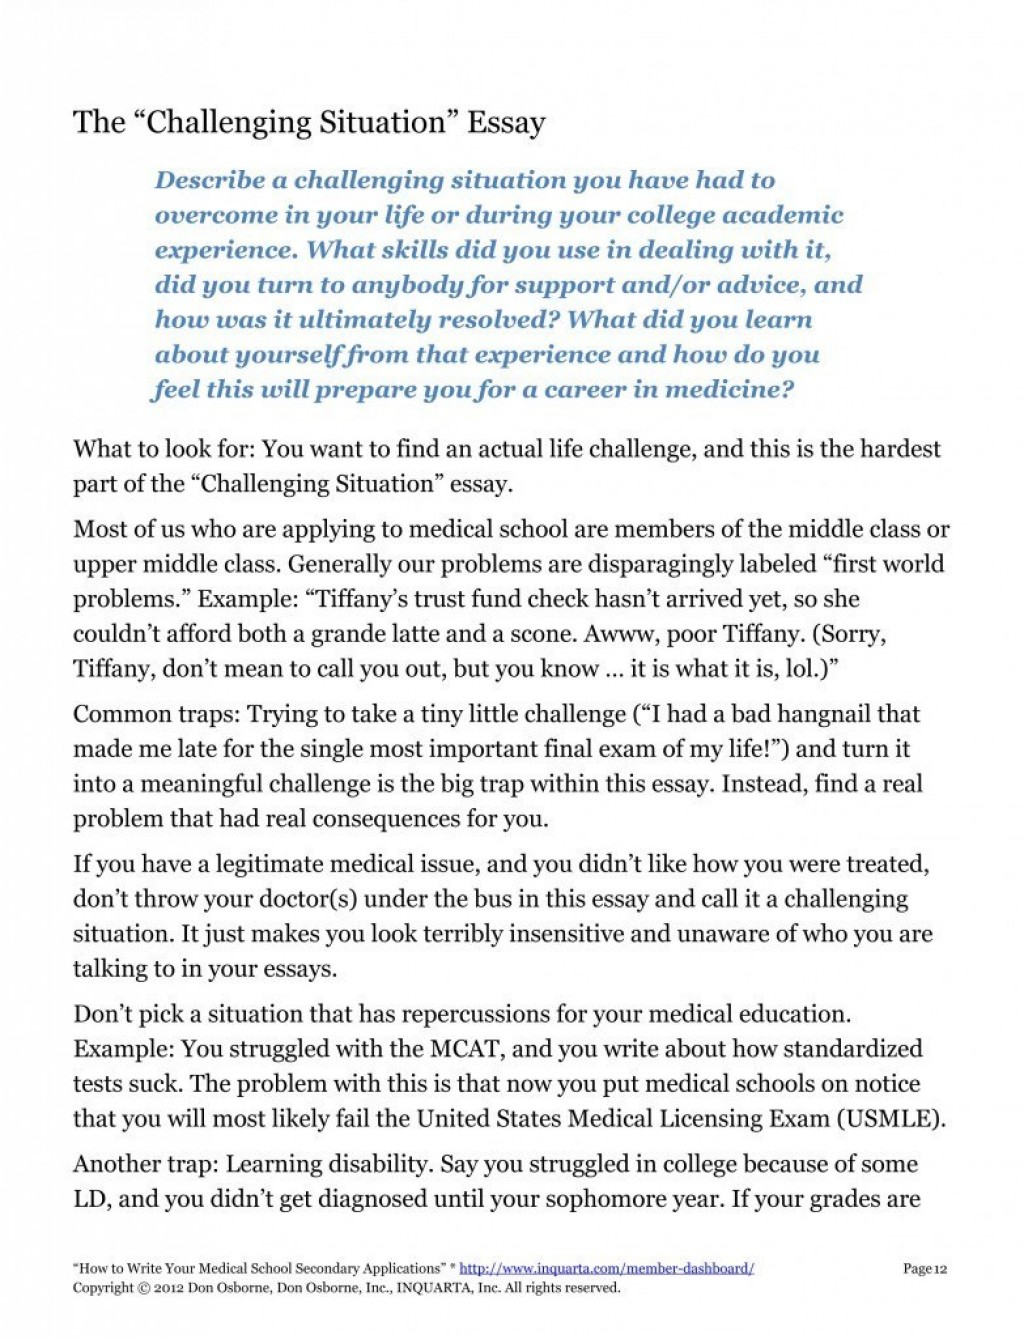 007 Medschoolsecondaries Spyshot1 783x1024 Diversity Essay Sample Fascinating Law School Large